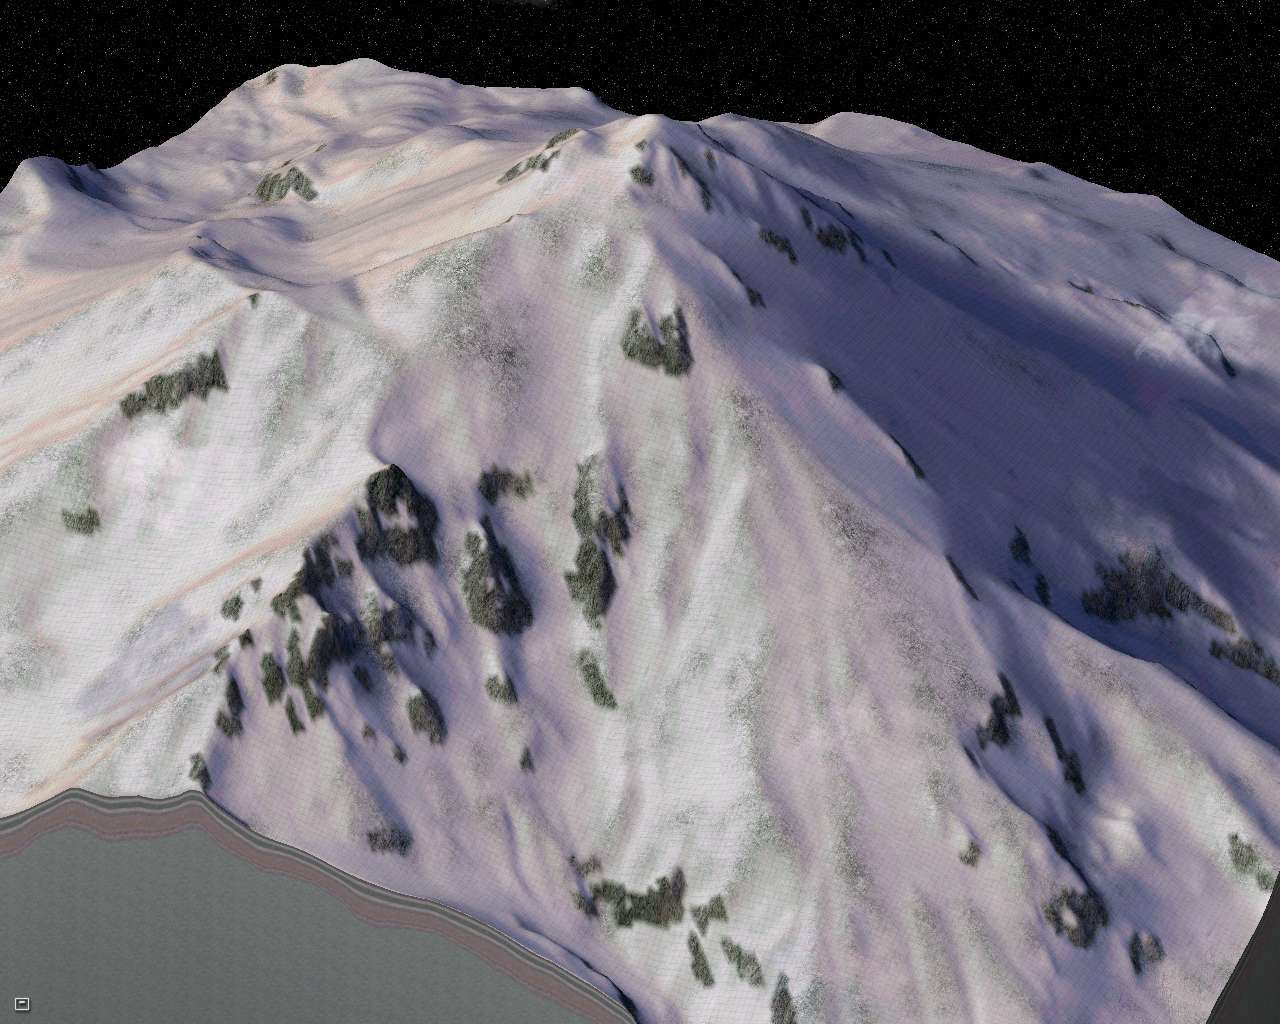 terrain%20tut%20mtn%20after2.jpg?psid=1